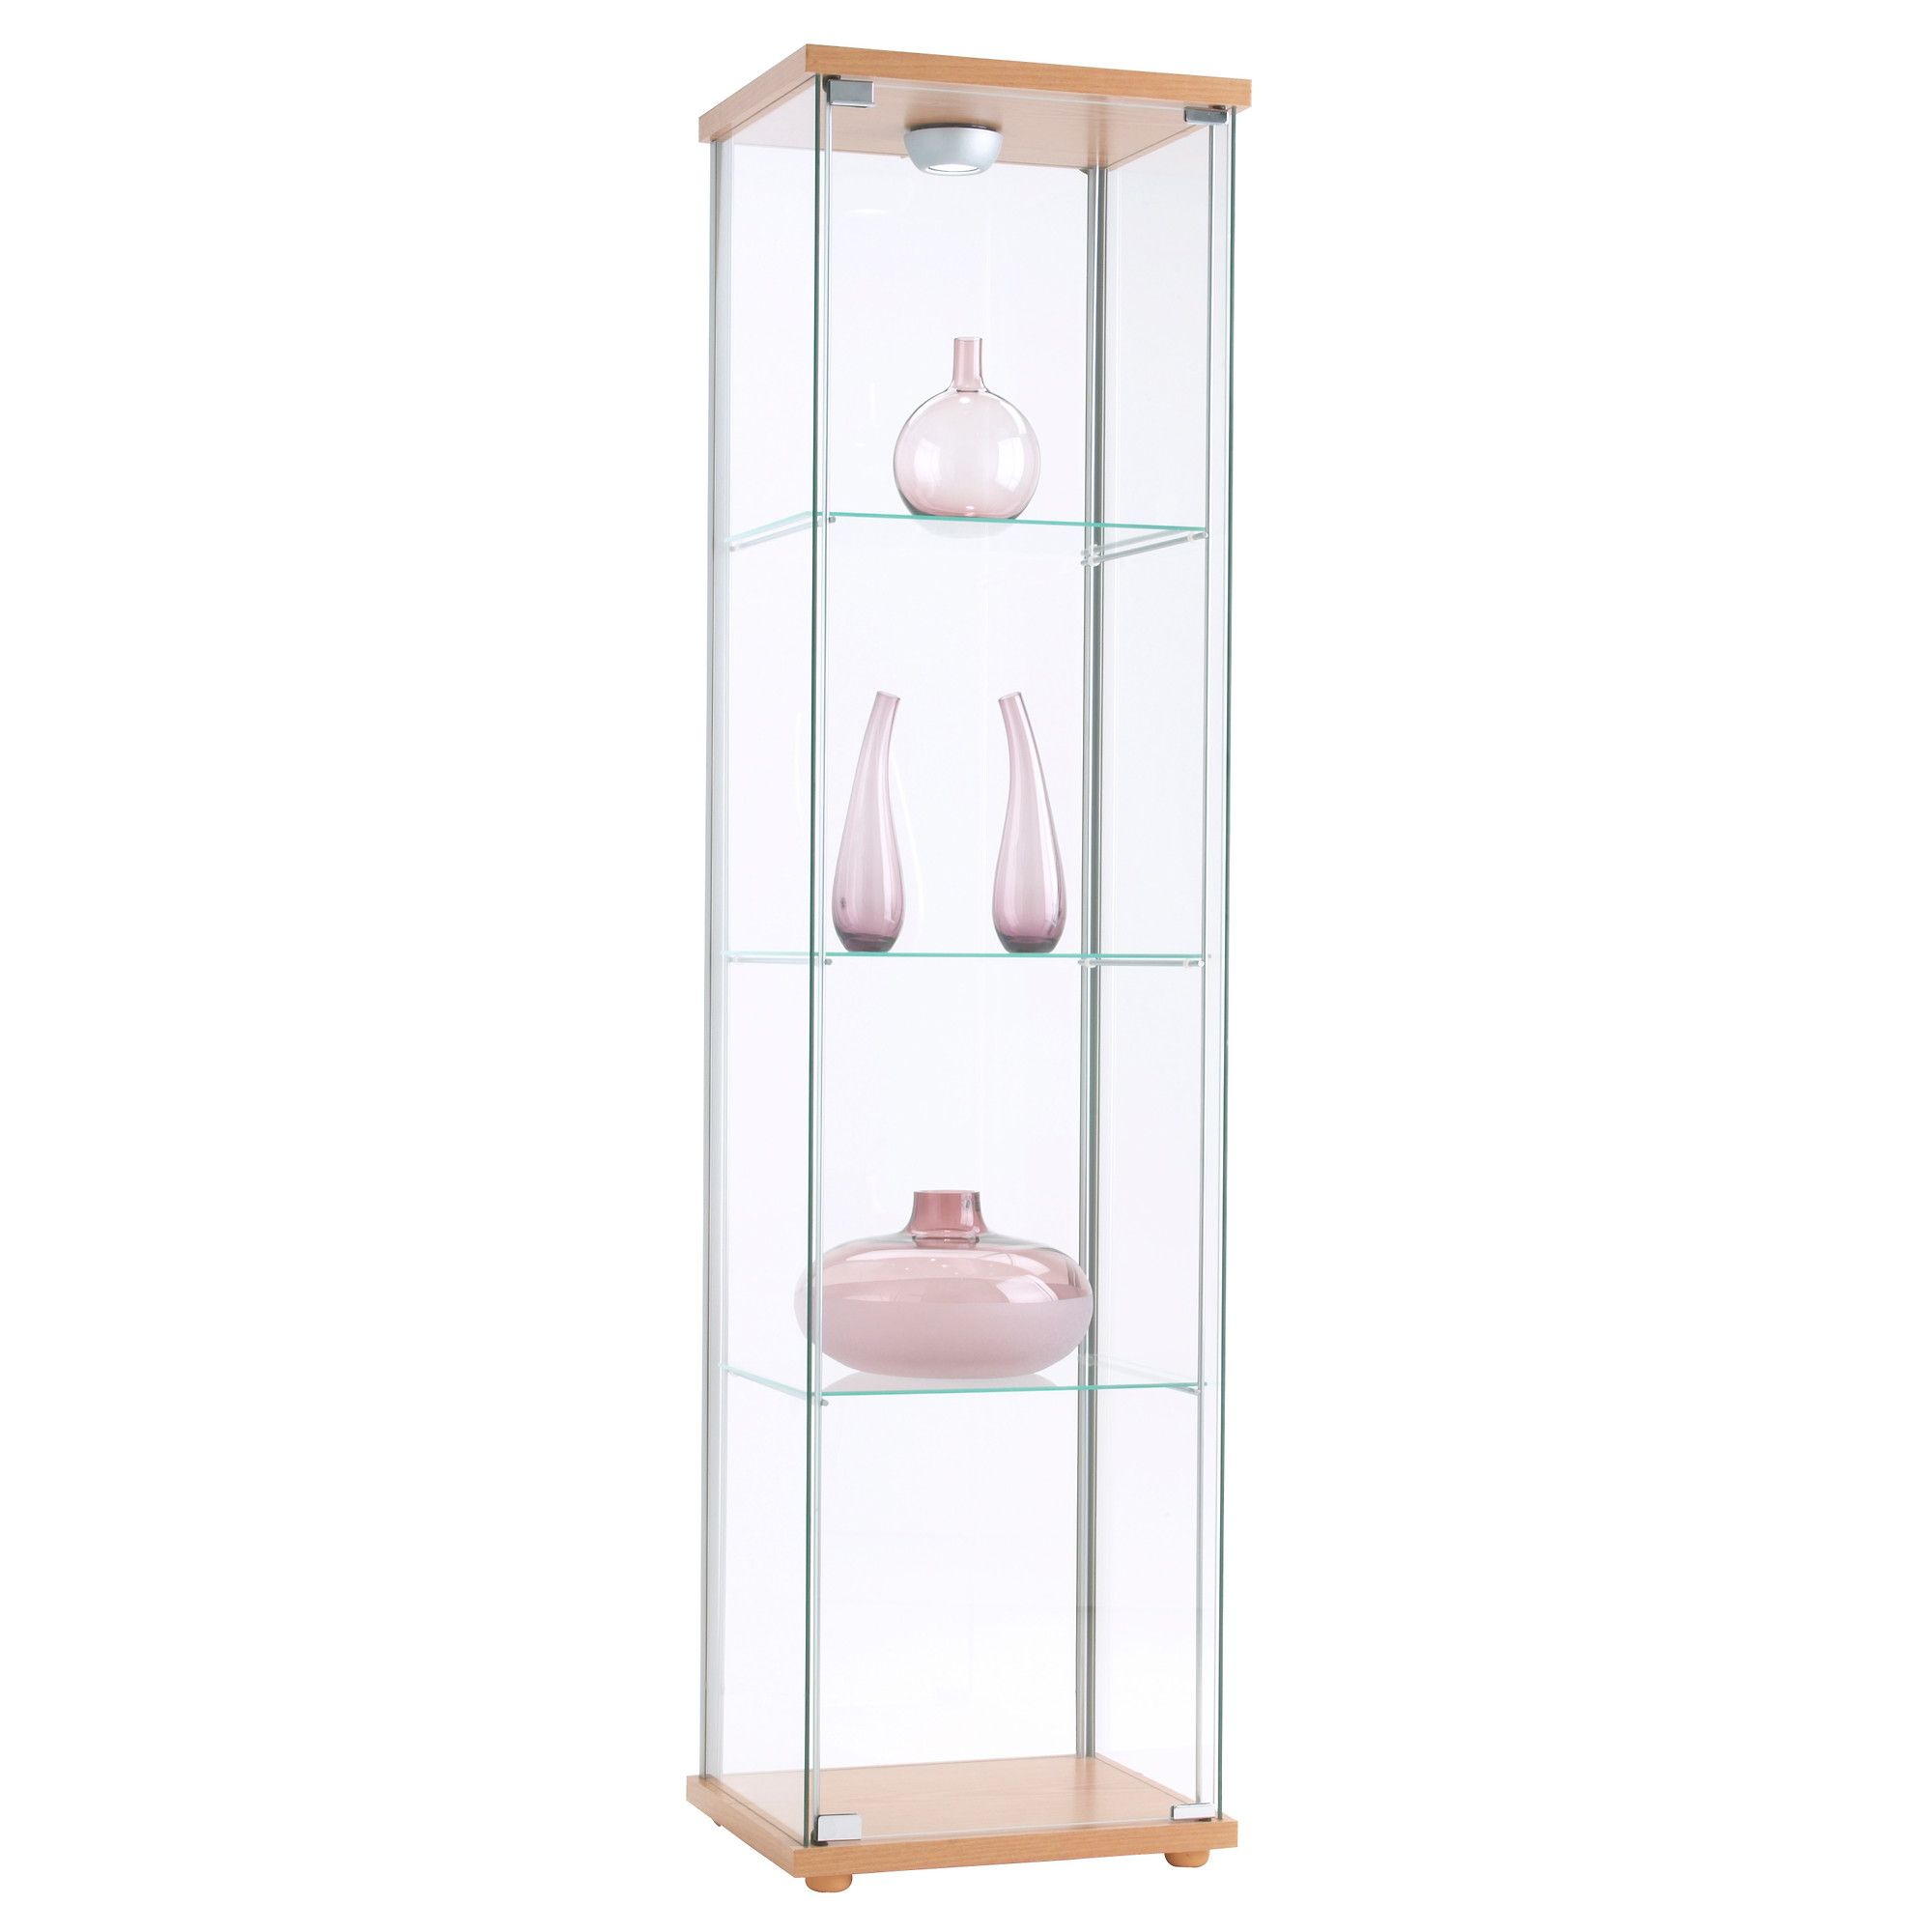 Detolf Glass Cabinet Light Homeminimalist